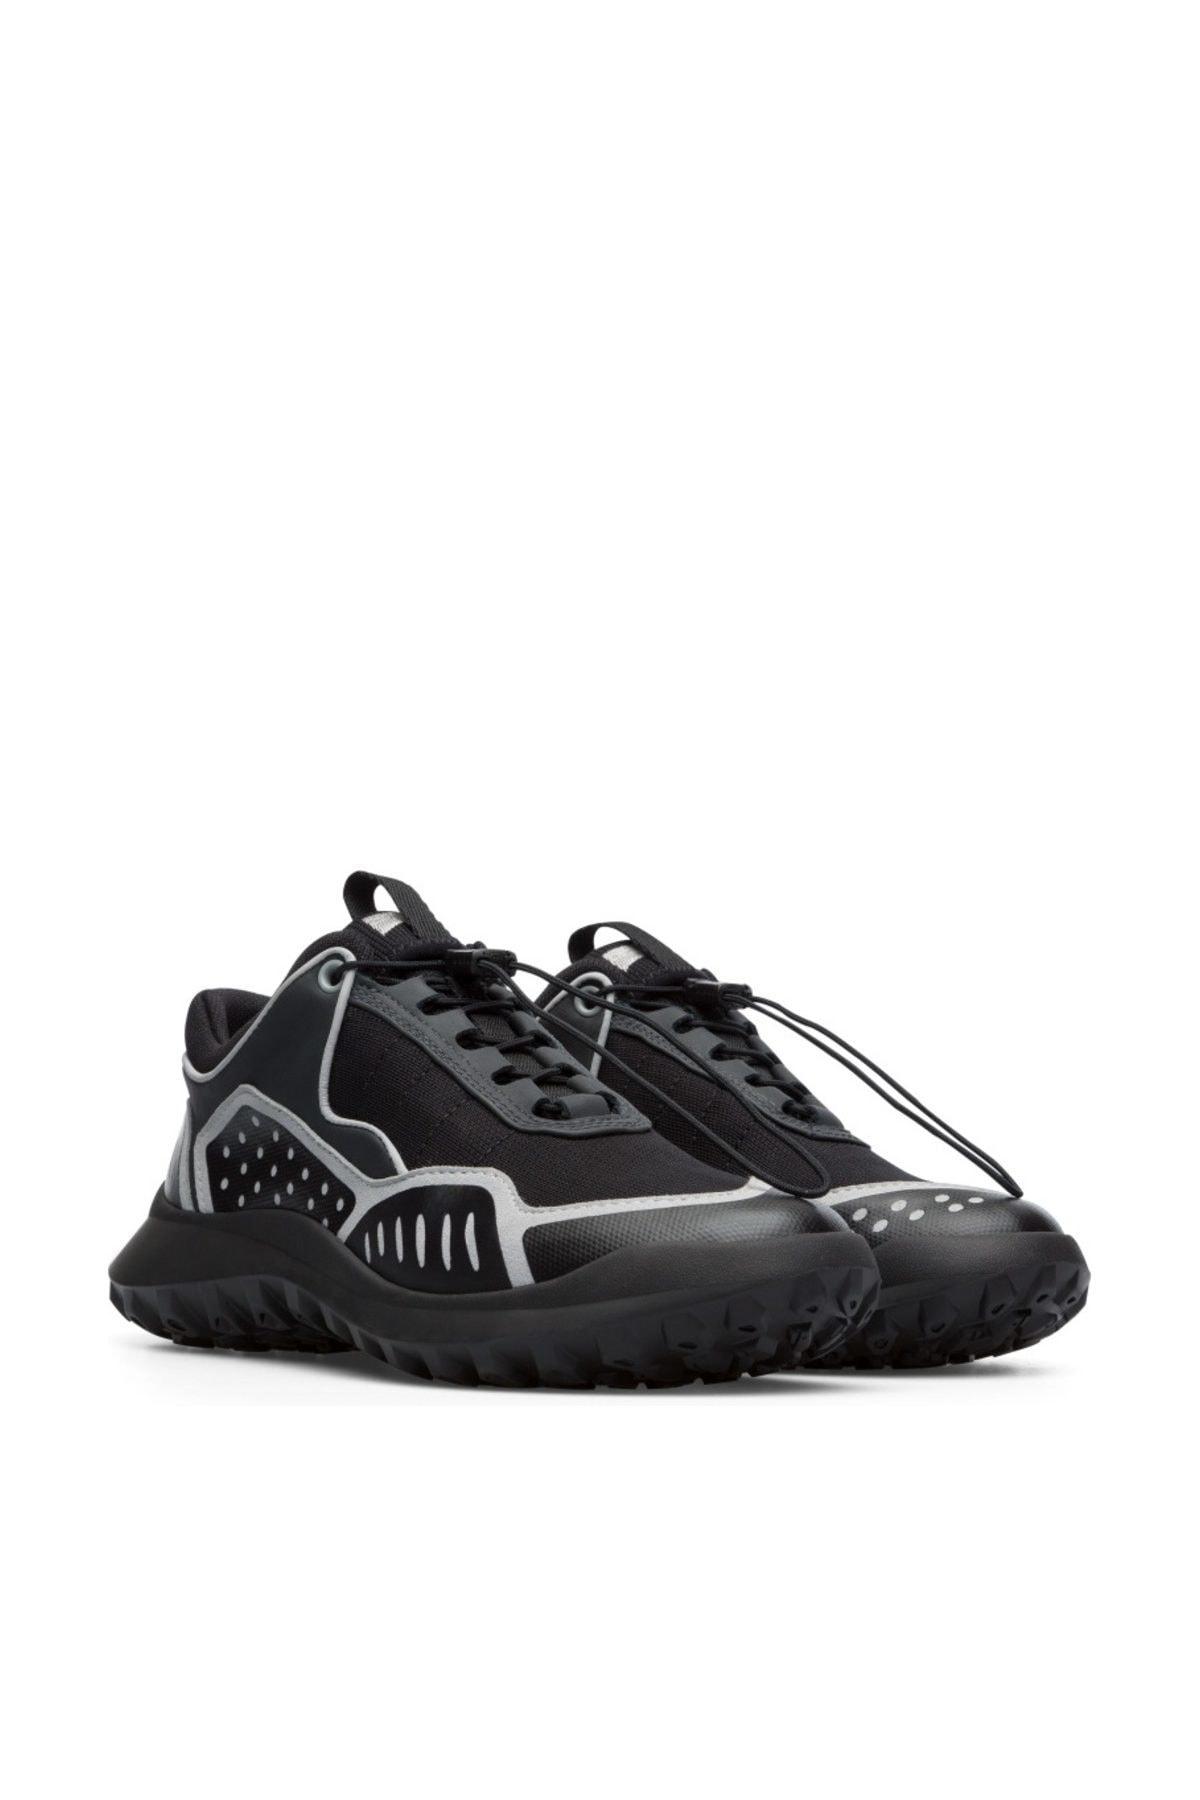 CAMPER Kadın Crclr Sneaker K200886-004 2